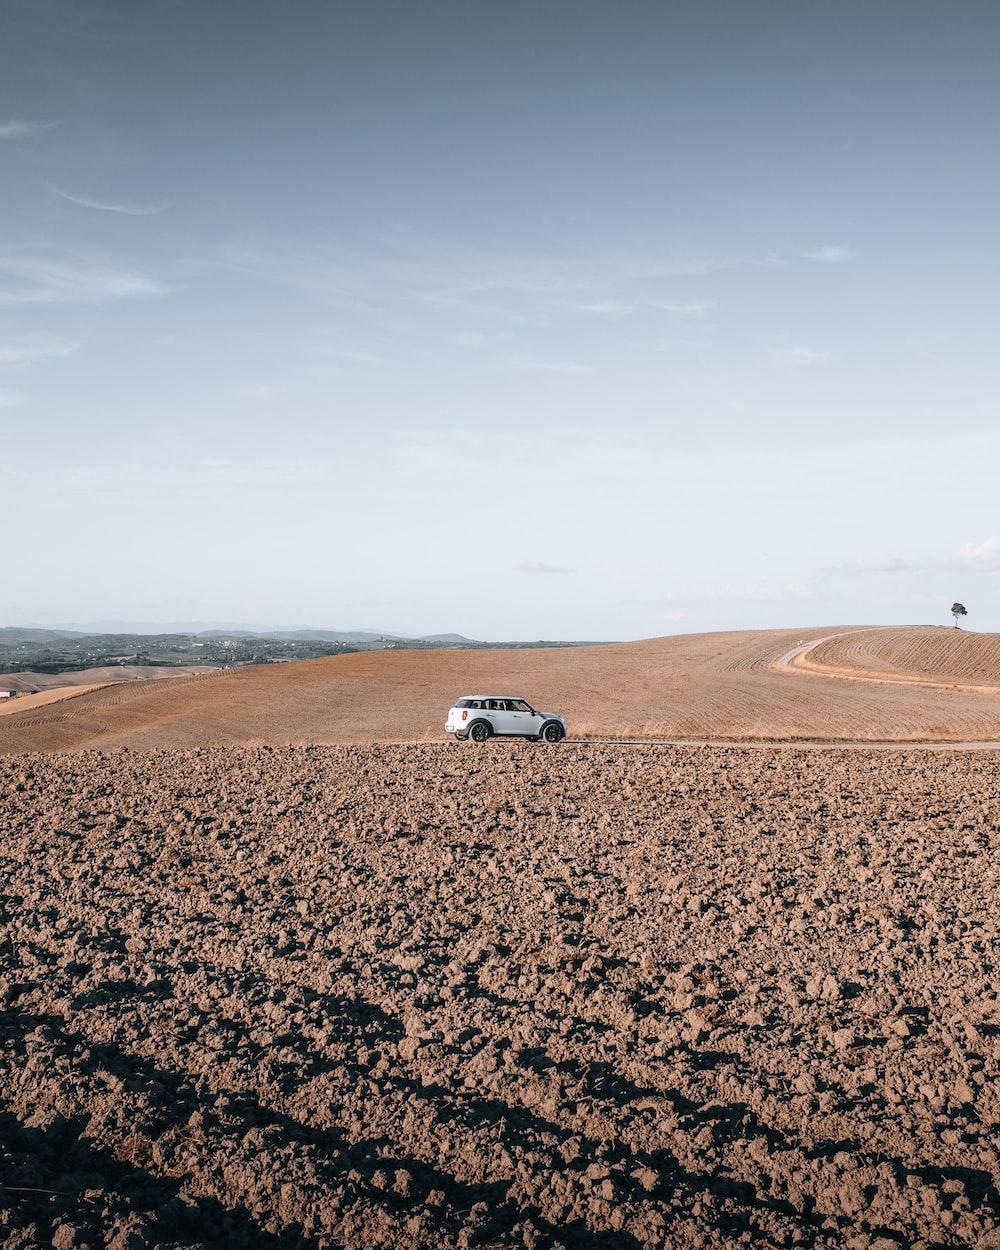 white car on brown sand during daytime